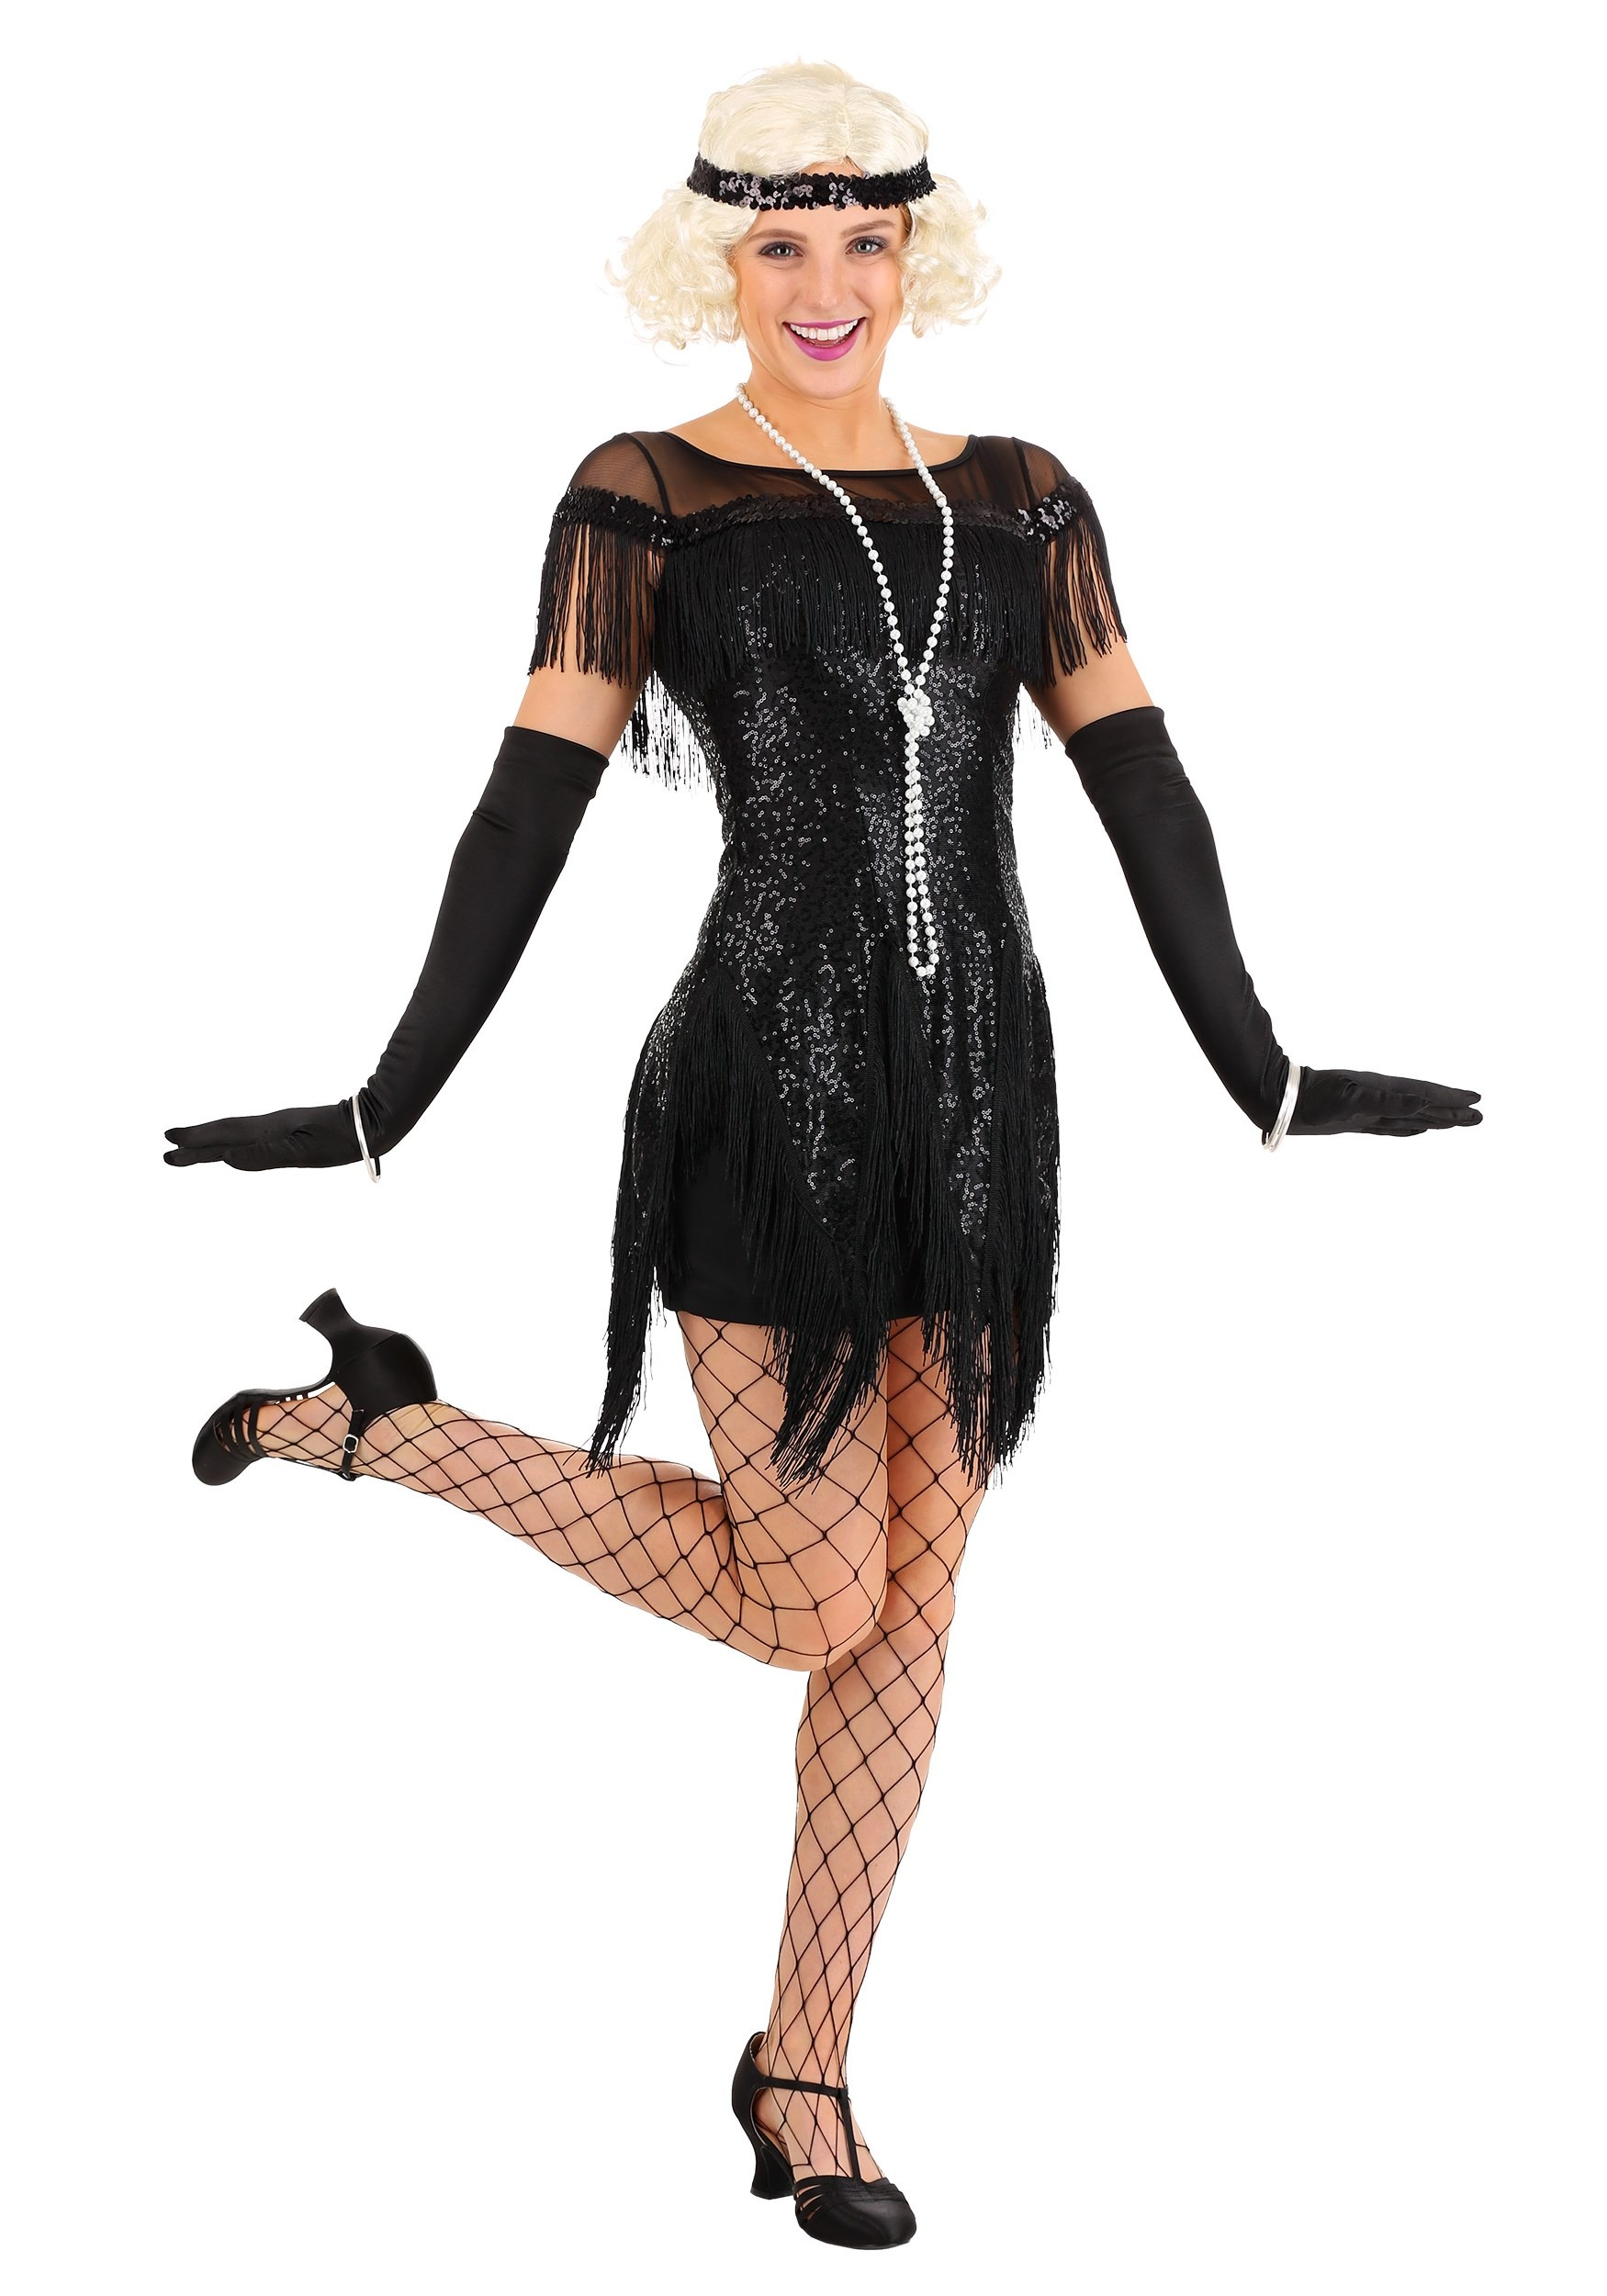 Flapper Costumes & 1920's Dresses - HalloweenCostumes.com